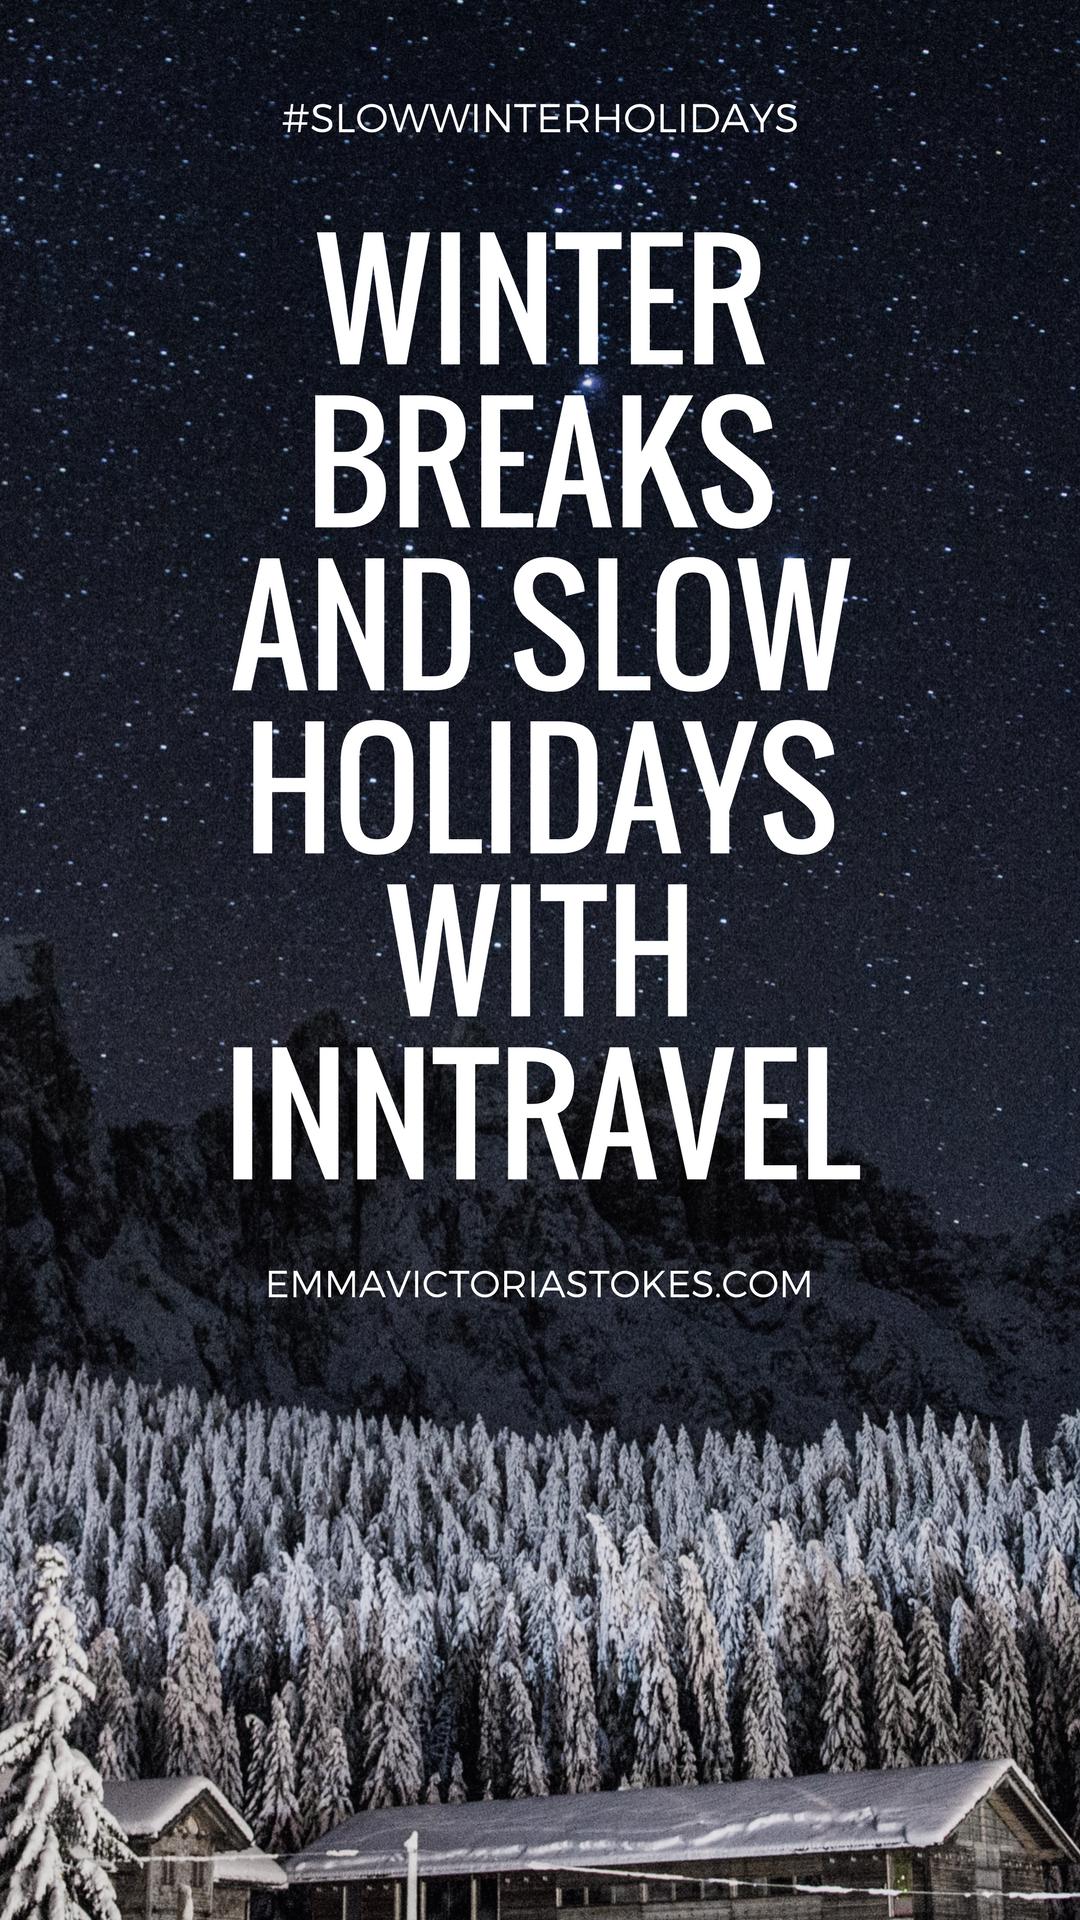 Emma Victoria Stokes Inntravel Slow Holidays Blogger Campaign